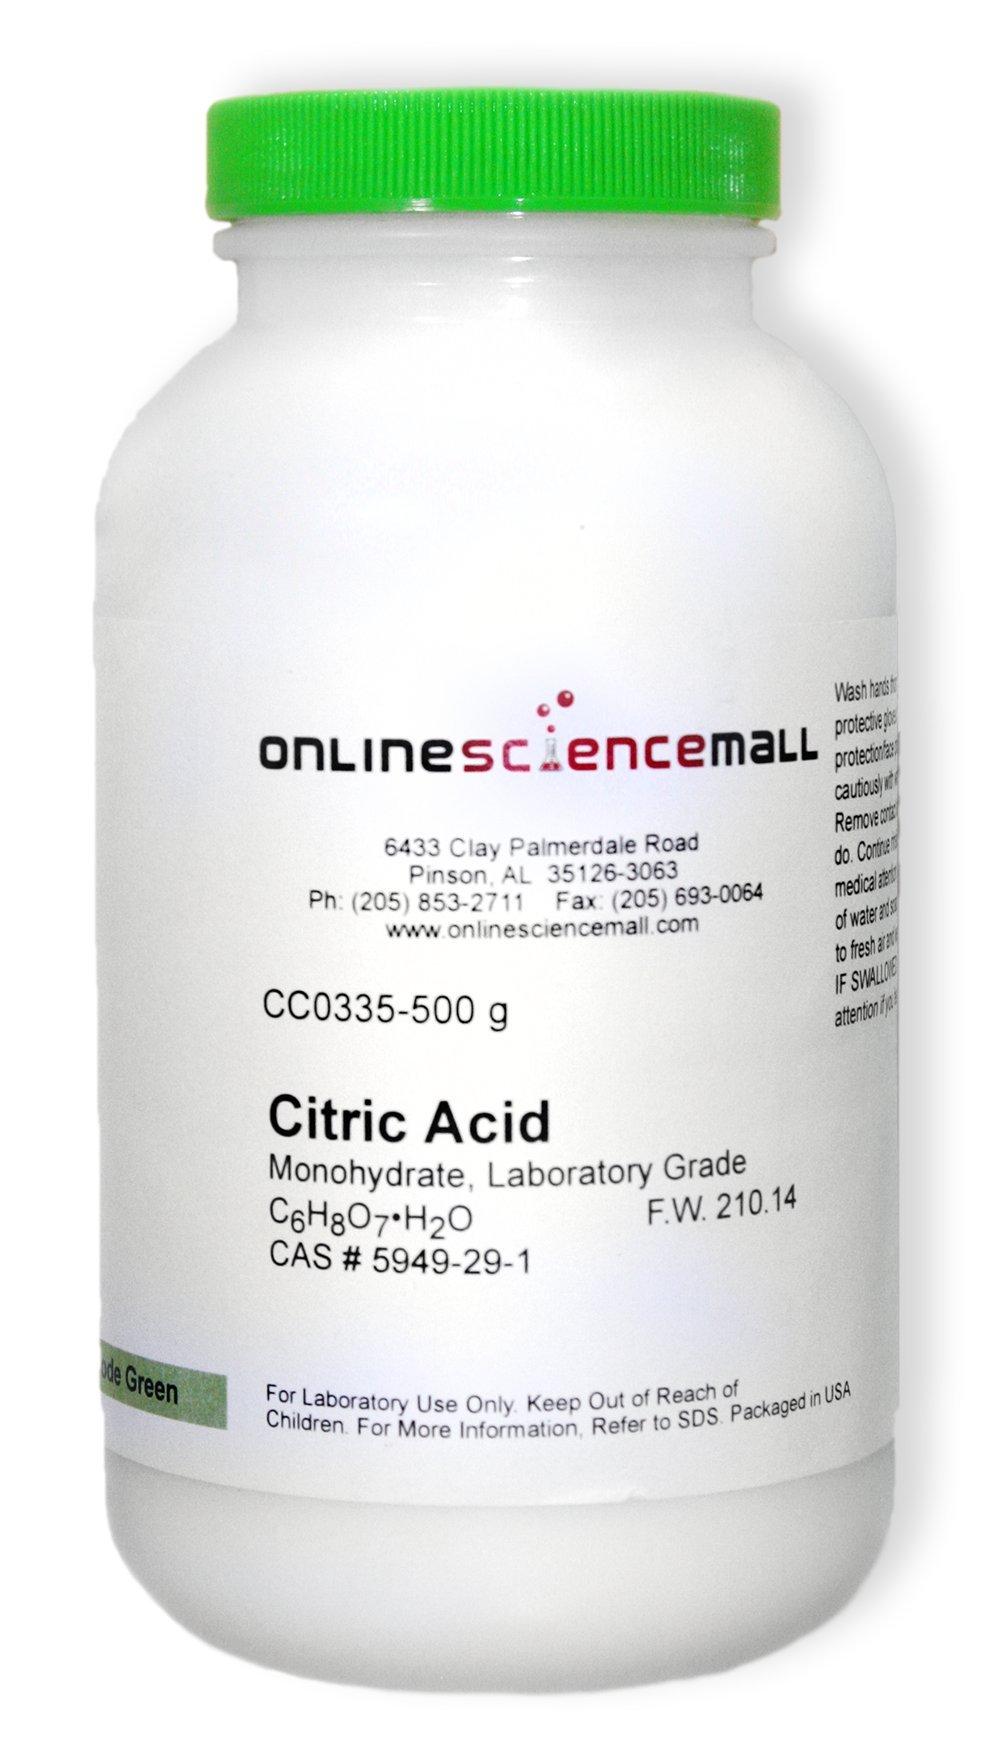 Citric Acid, Monohydrate, 500g - Lab Grade Chemical Reagent